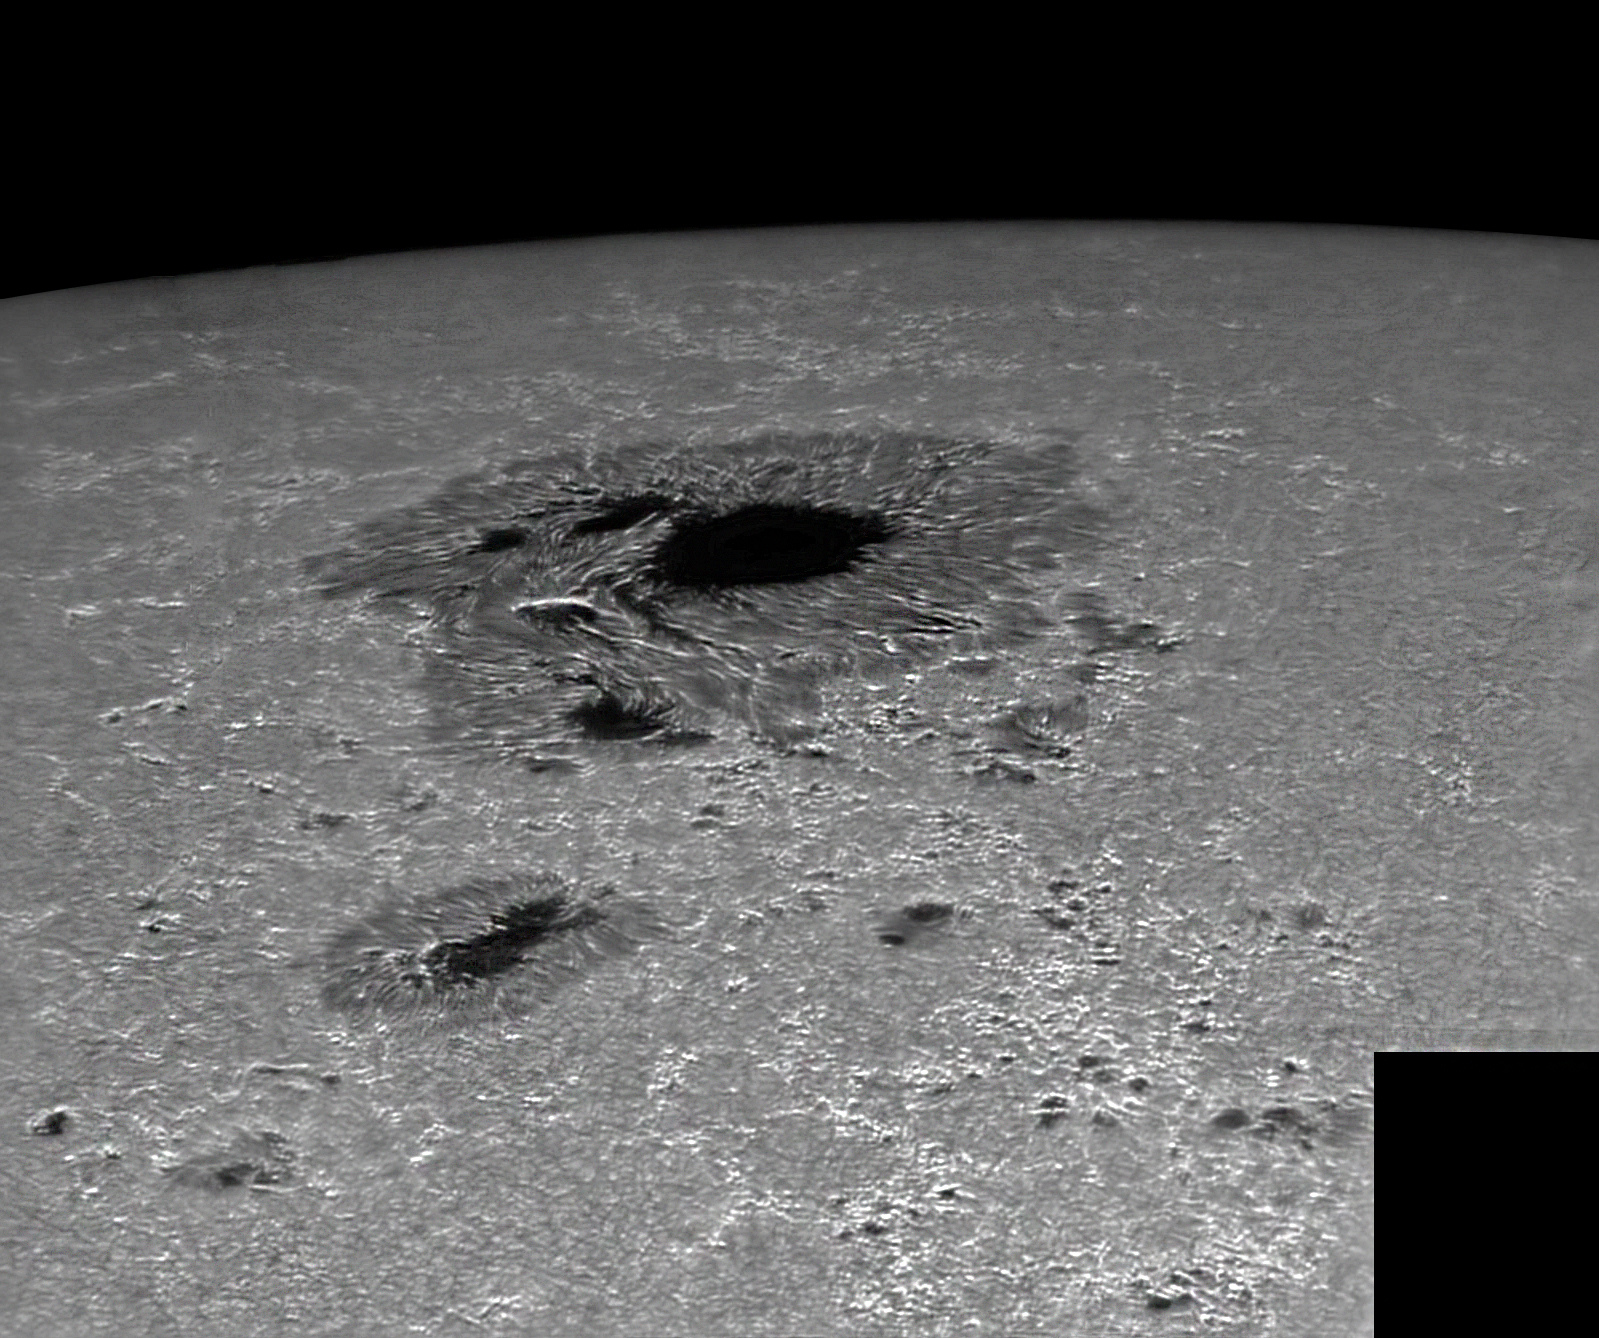 18 oct 2014 Lunette 204 mm F8,8 + continuum.jpg